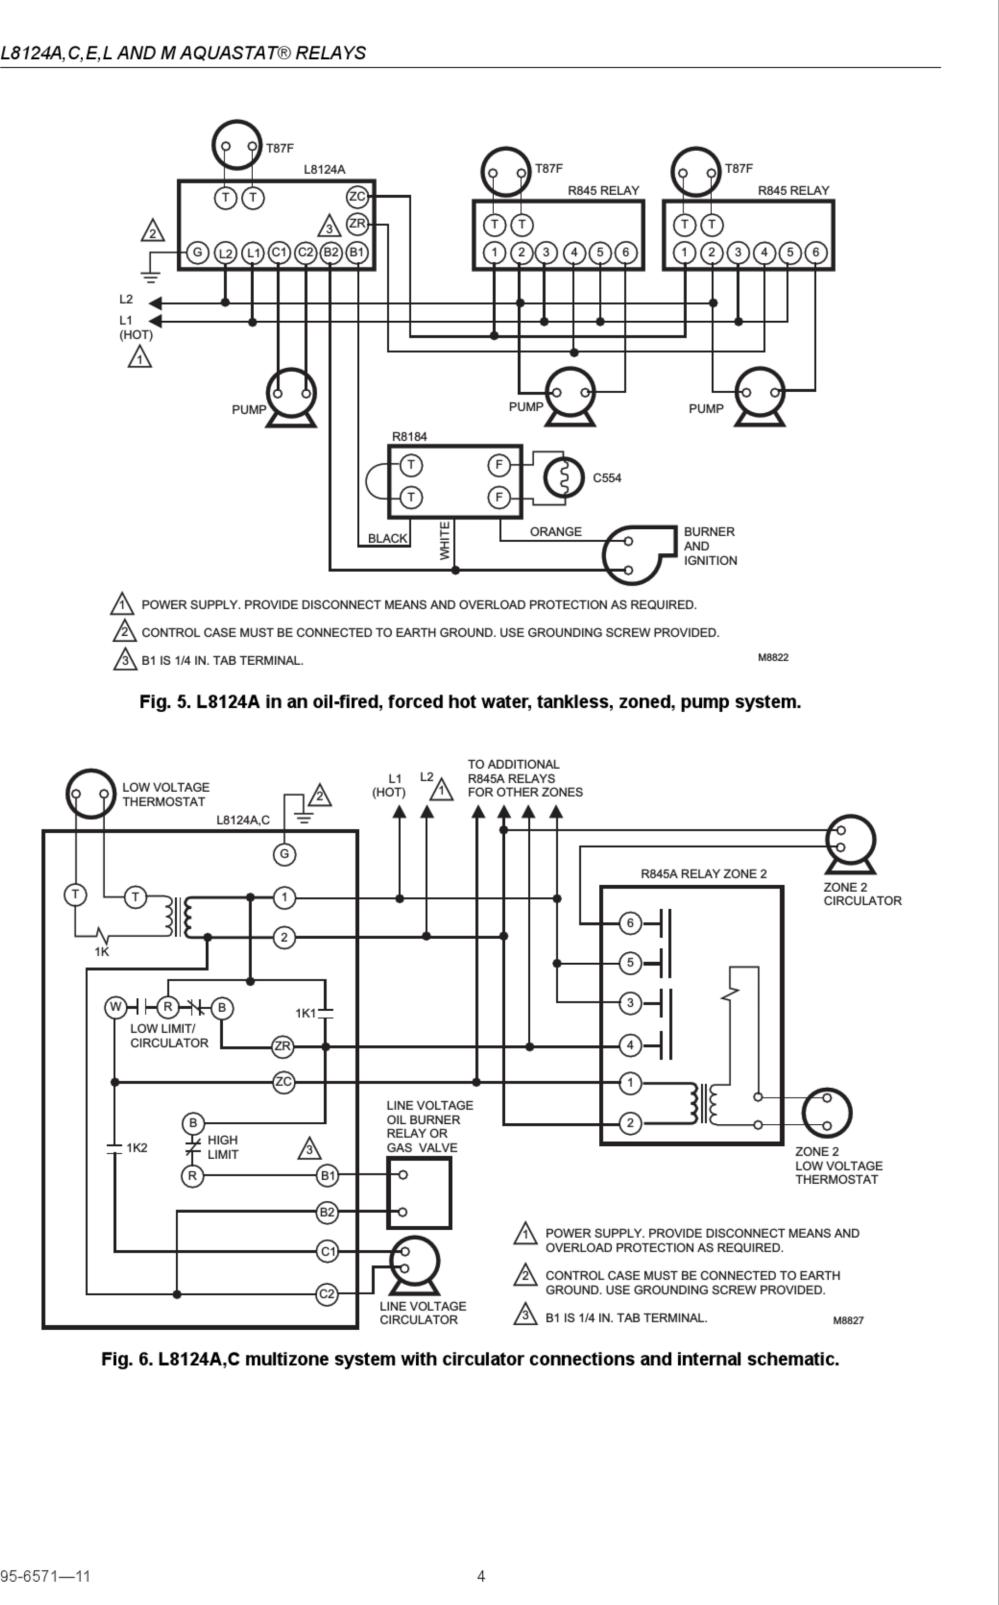 medium resolution of honeywell l8124a wiring diagram wiring diagram sheet l8124a aquastat wiring diagram